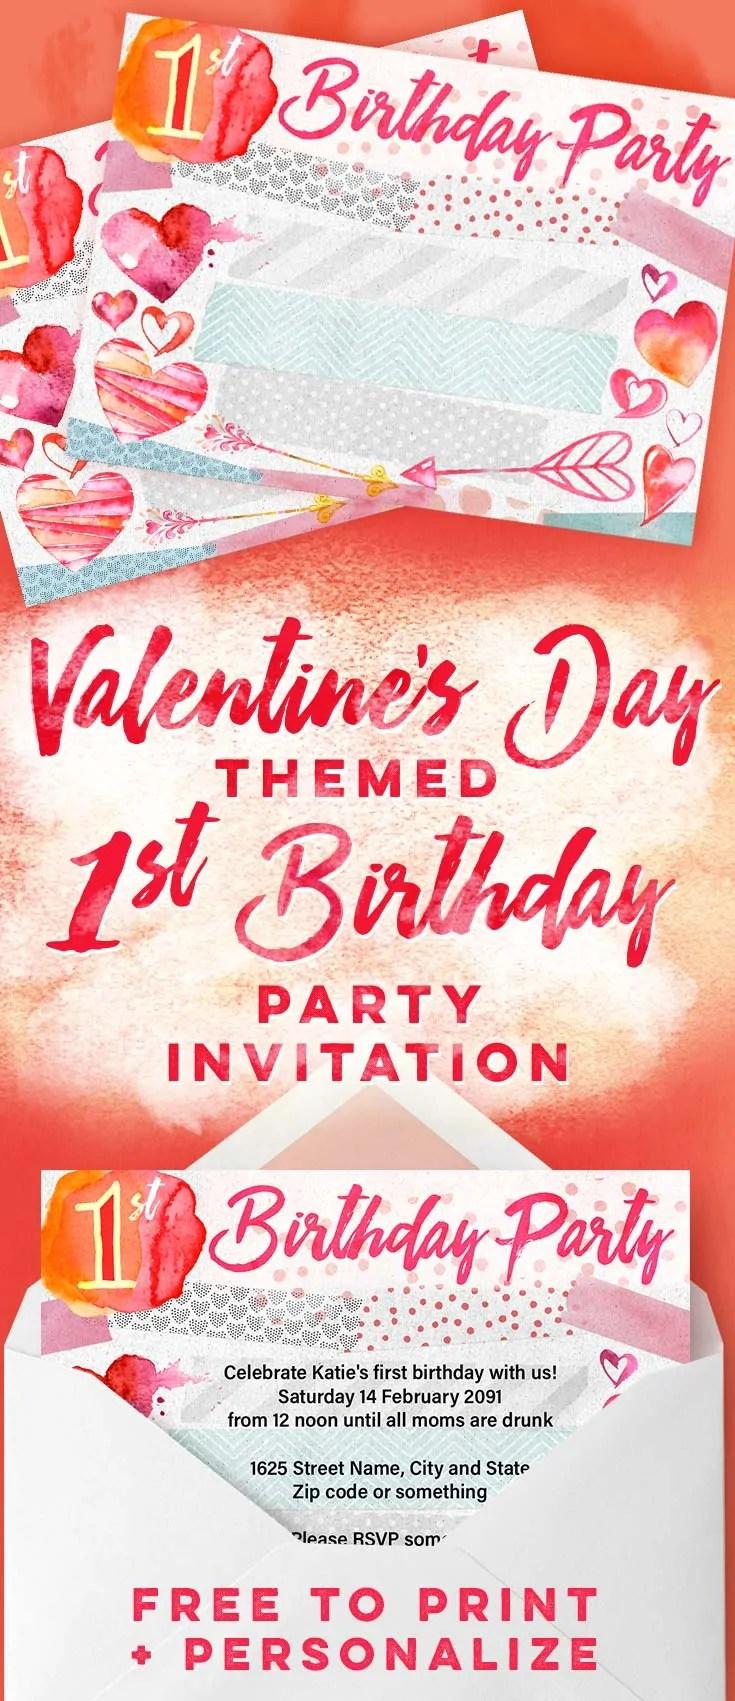 Valentines Day 1st Birthday Party Invitations Free